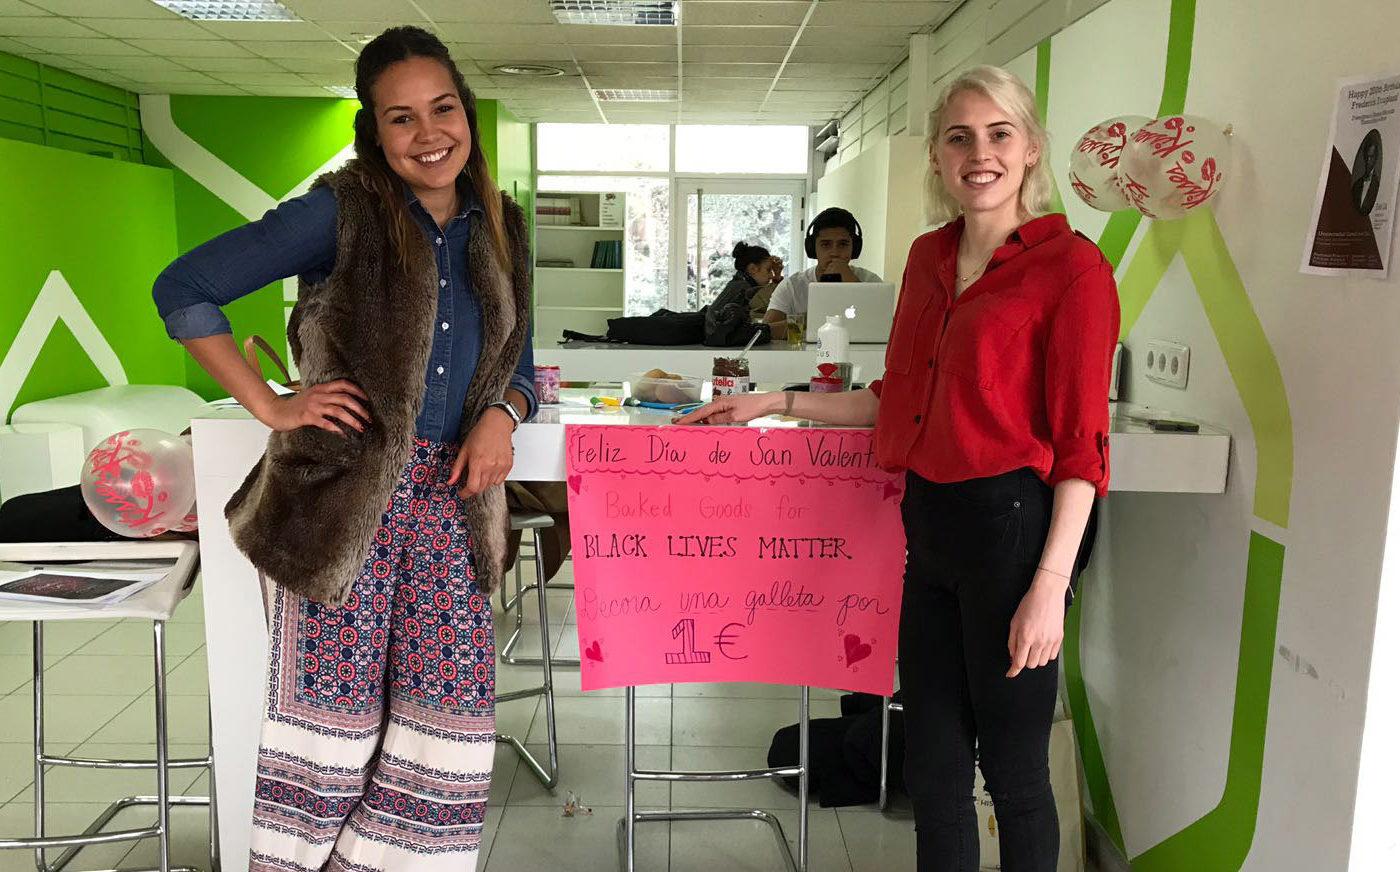 Fulbright scholars McCall Wells, left, and Danielle Elliott are organizing an interfaith seder at the Universidad Camilo José Sela in Villafranca del Castillo, Spain. (Photo/Melissa Marazas)